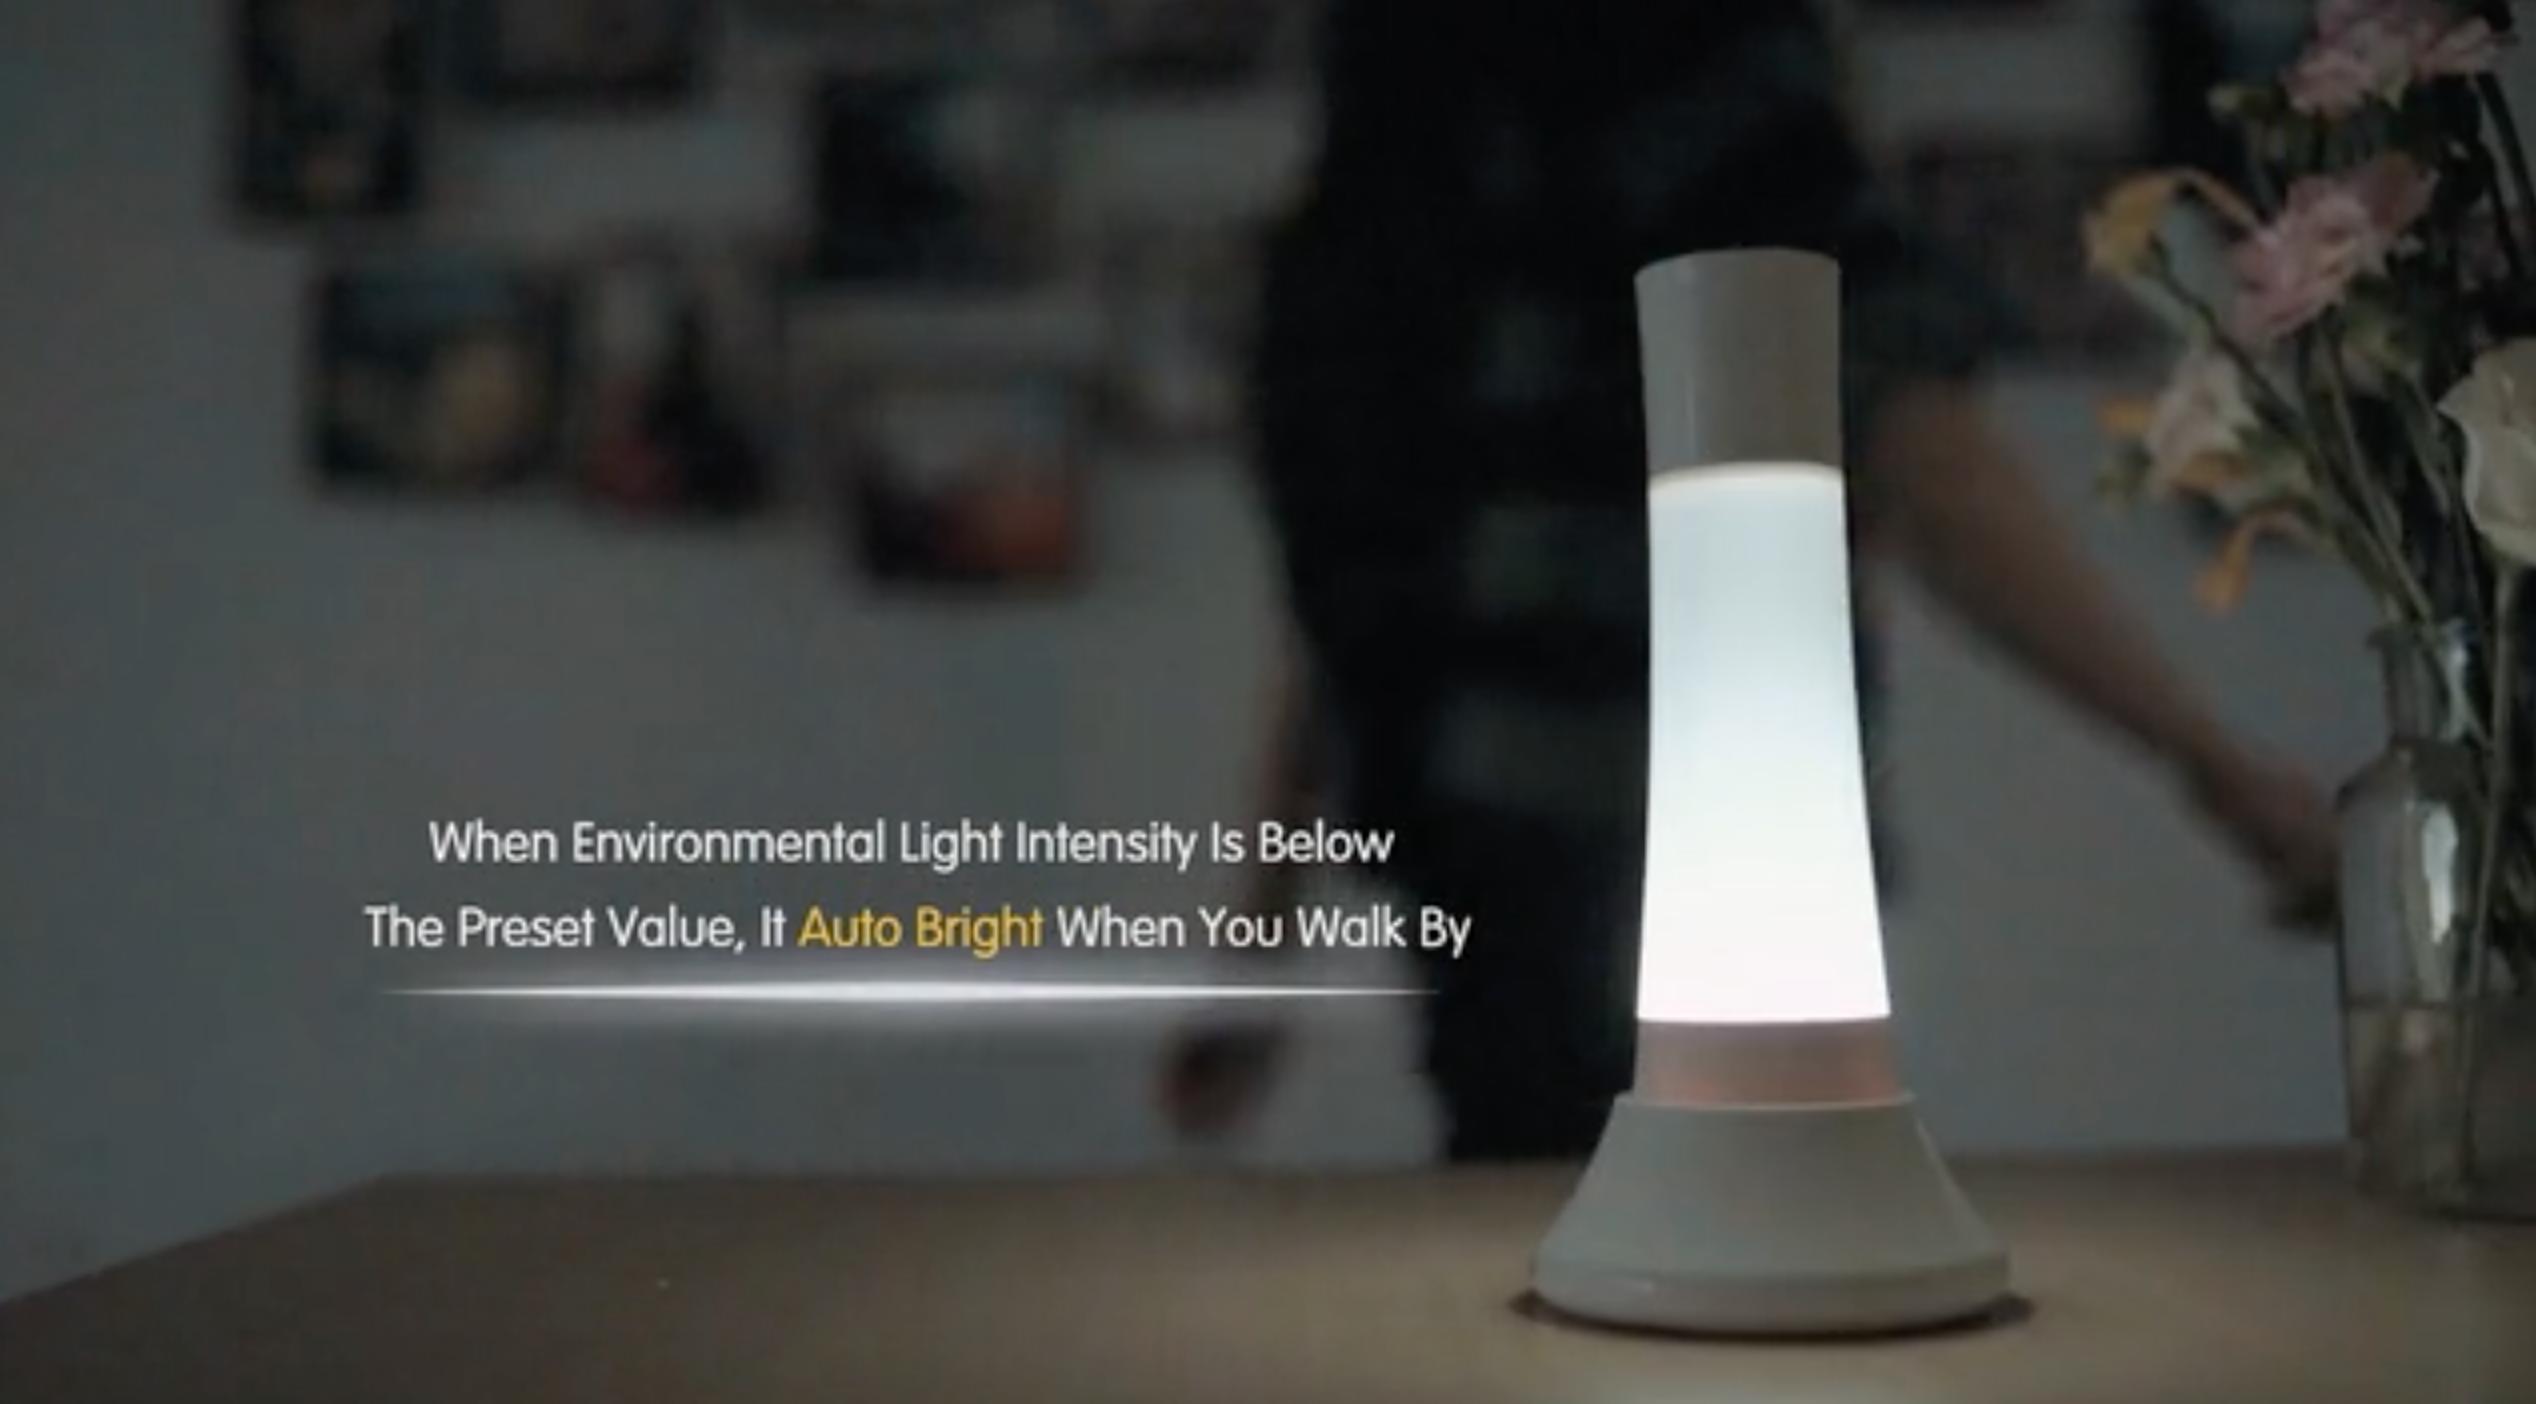 0bdfbcb4c8dd スタンド内部に距離6メートル、範囲120°の人感センサーが内蔵されており、通り過ぎると自動で点灯してくれるので、夜間などに便利だ。